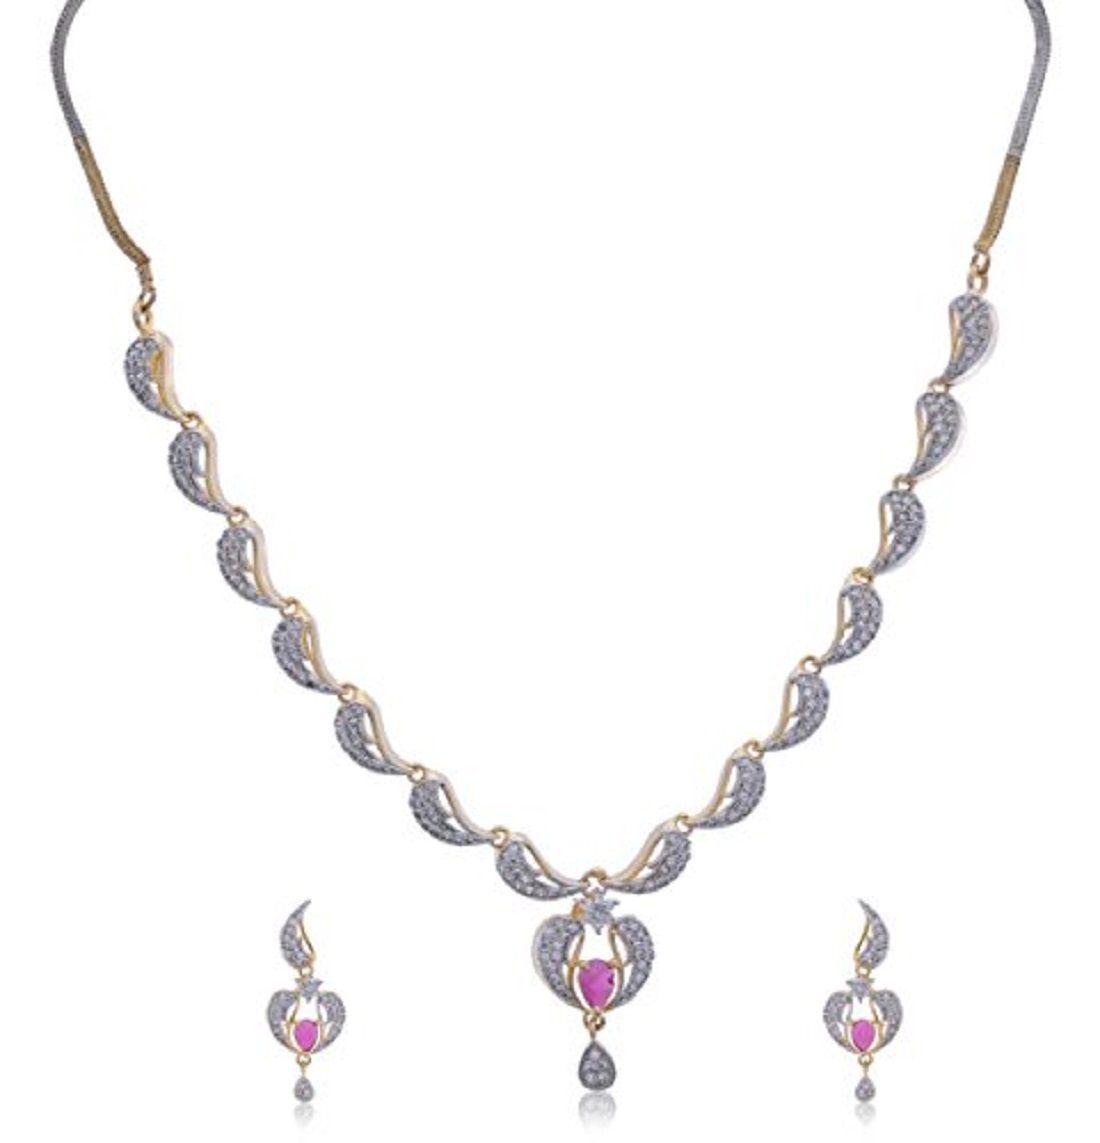 Jyesh Jewel Gold Plated American Diamond Choker Necklace With Drop Earrings Jewellery for Women & Girls